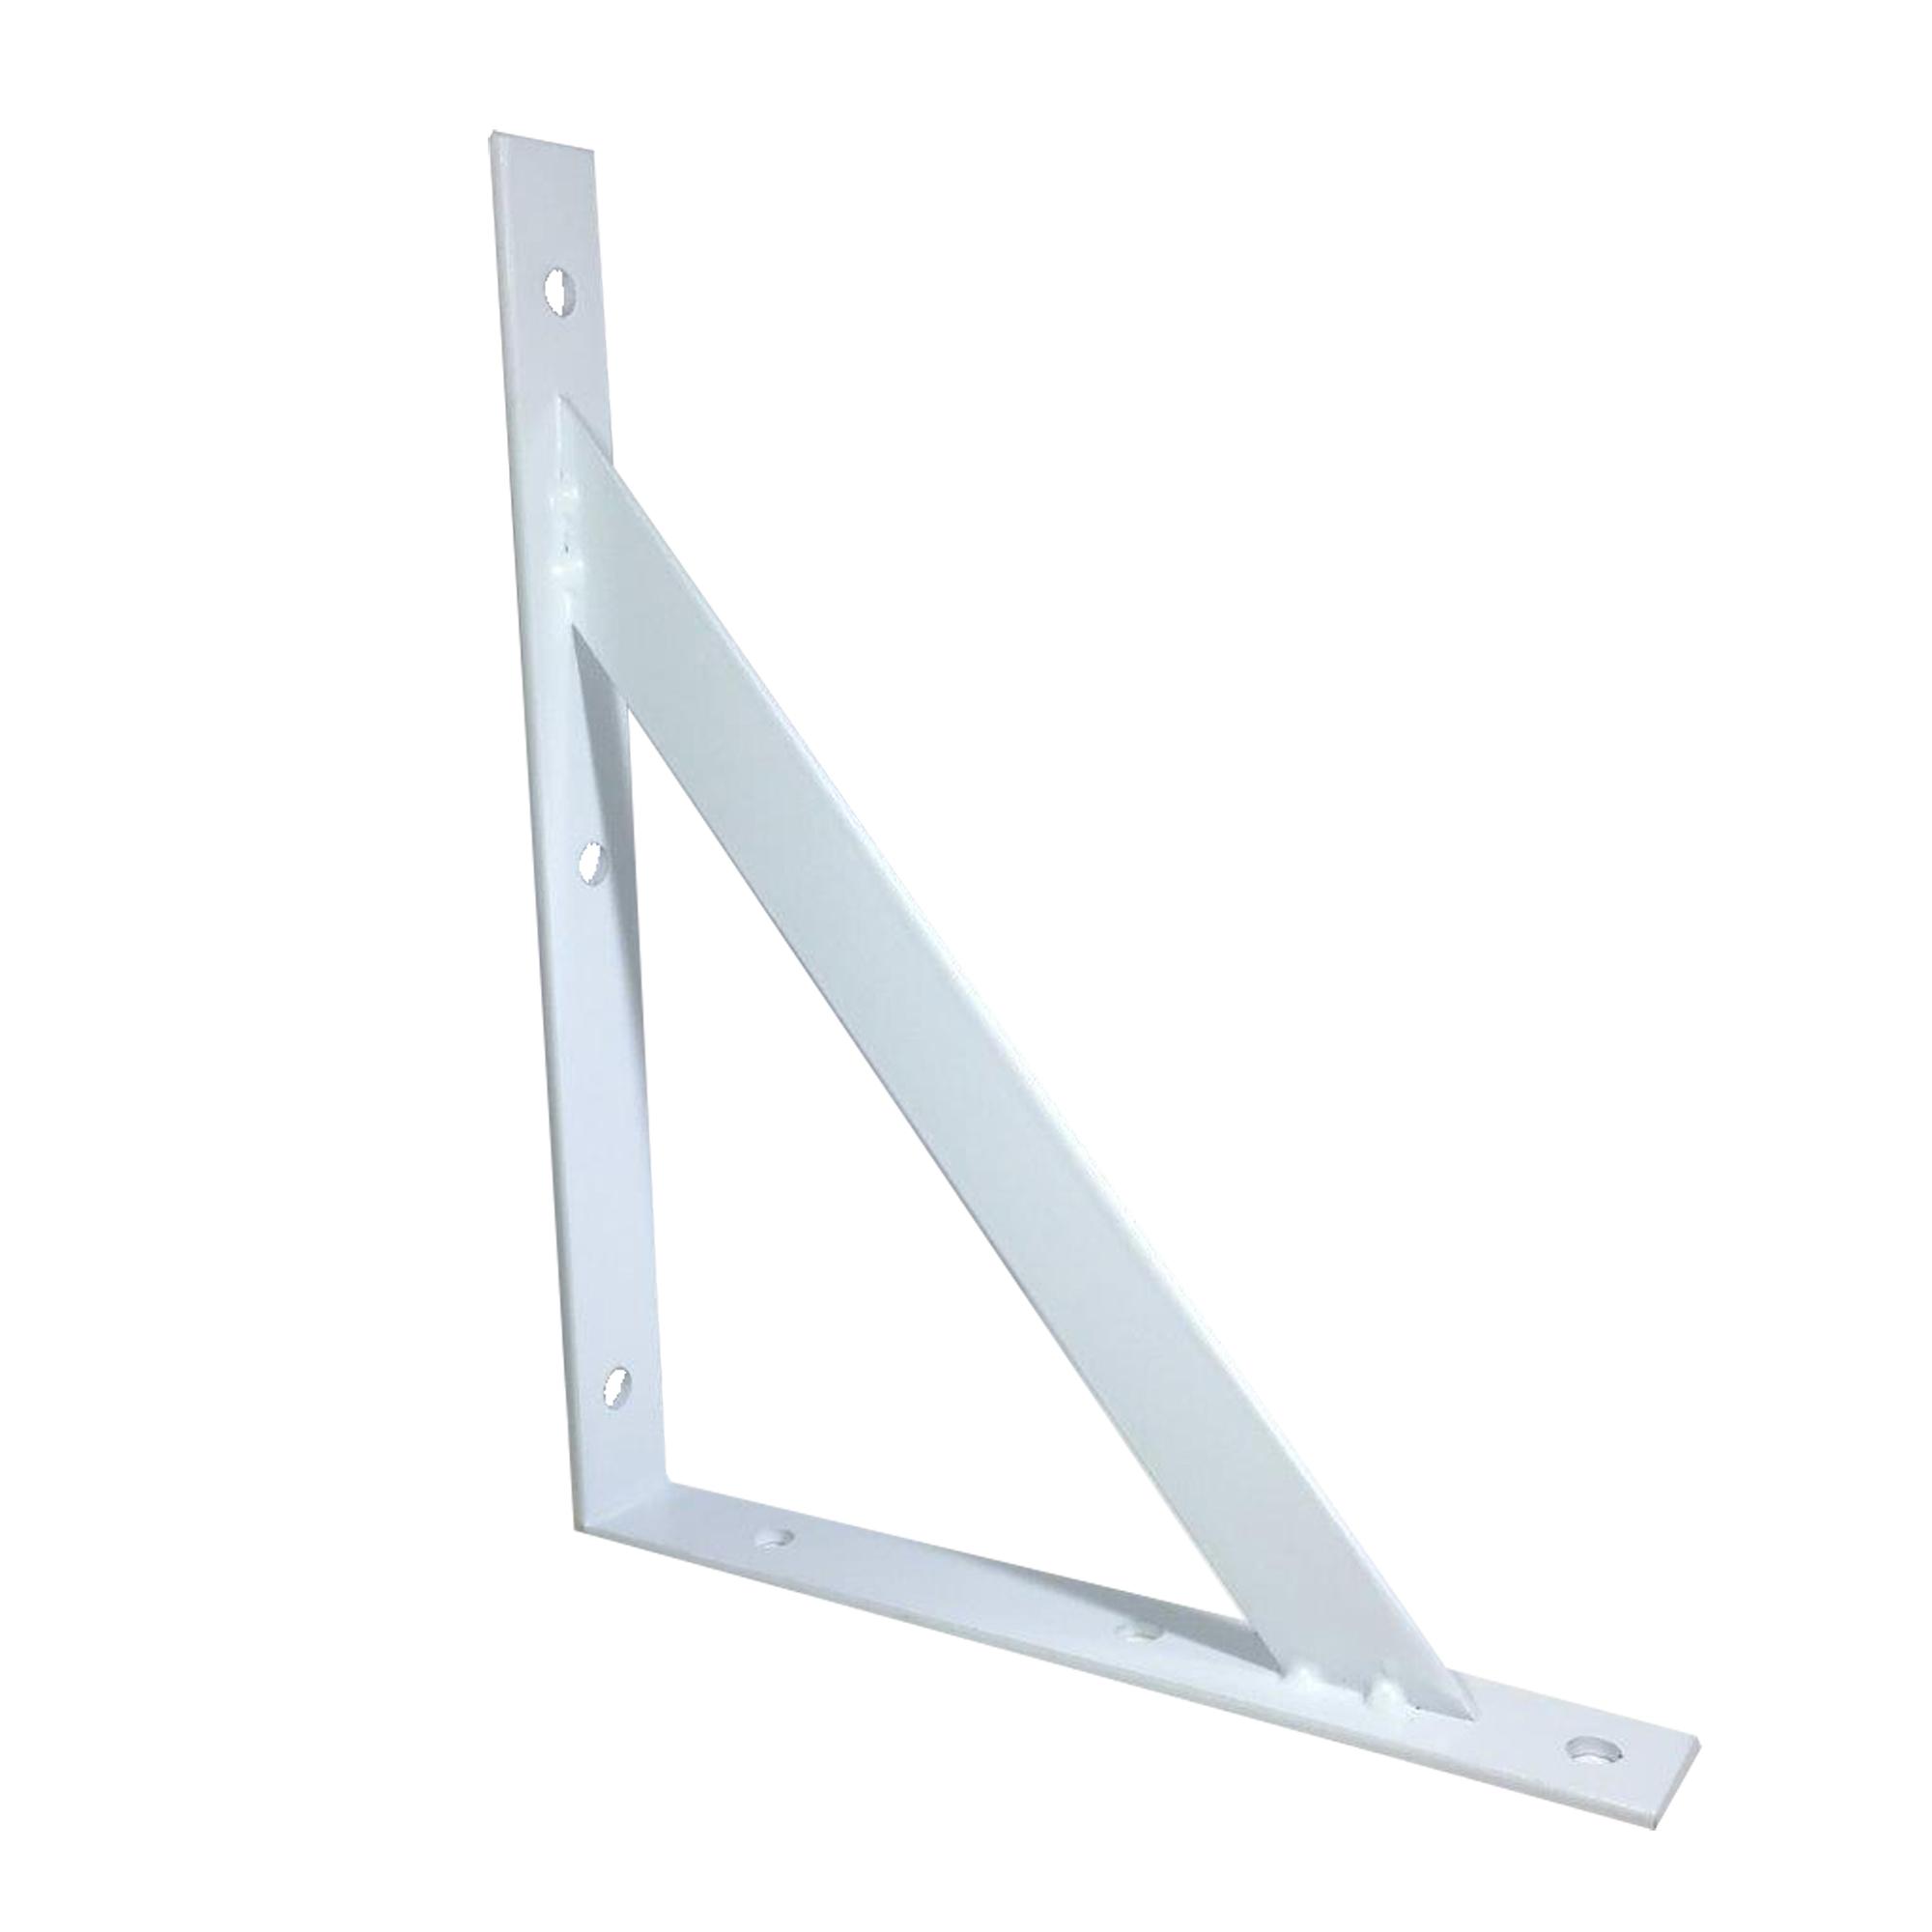 wall mount shelf bracket metal shelf hardware heavy duty bracket metal hanger 190715011306 ebay. Black Bedroom Furniture Sets. Home Design Ideas